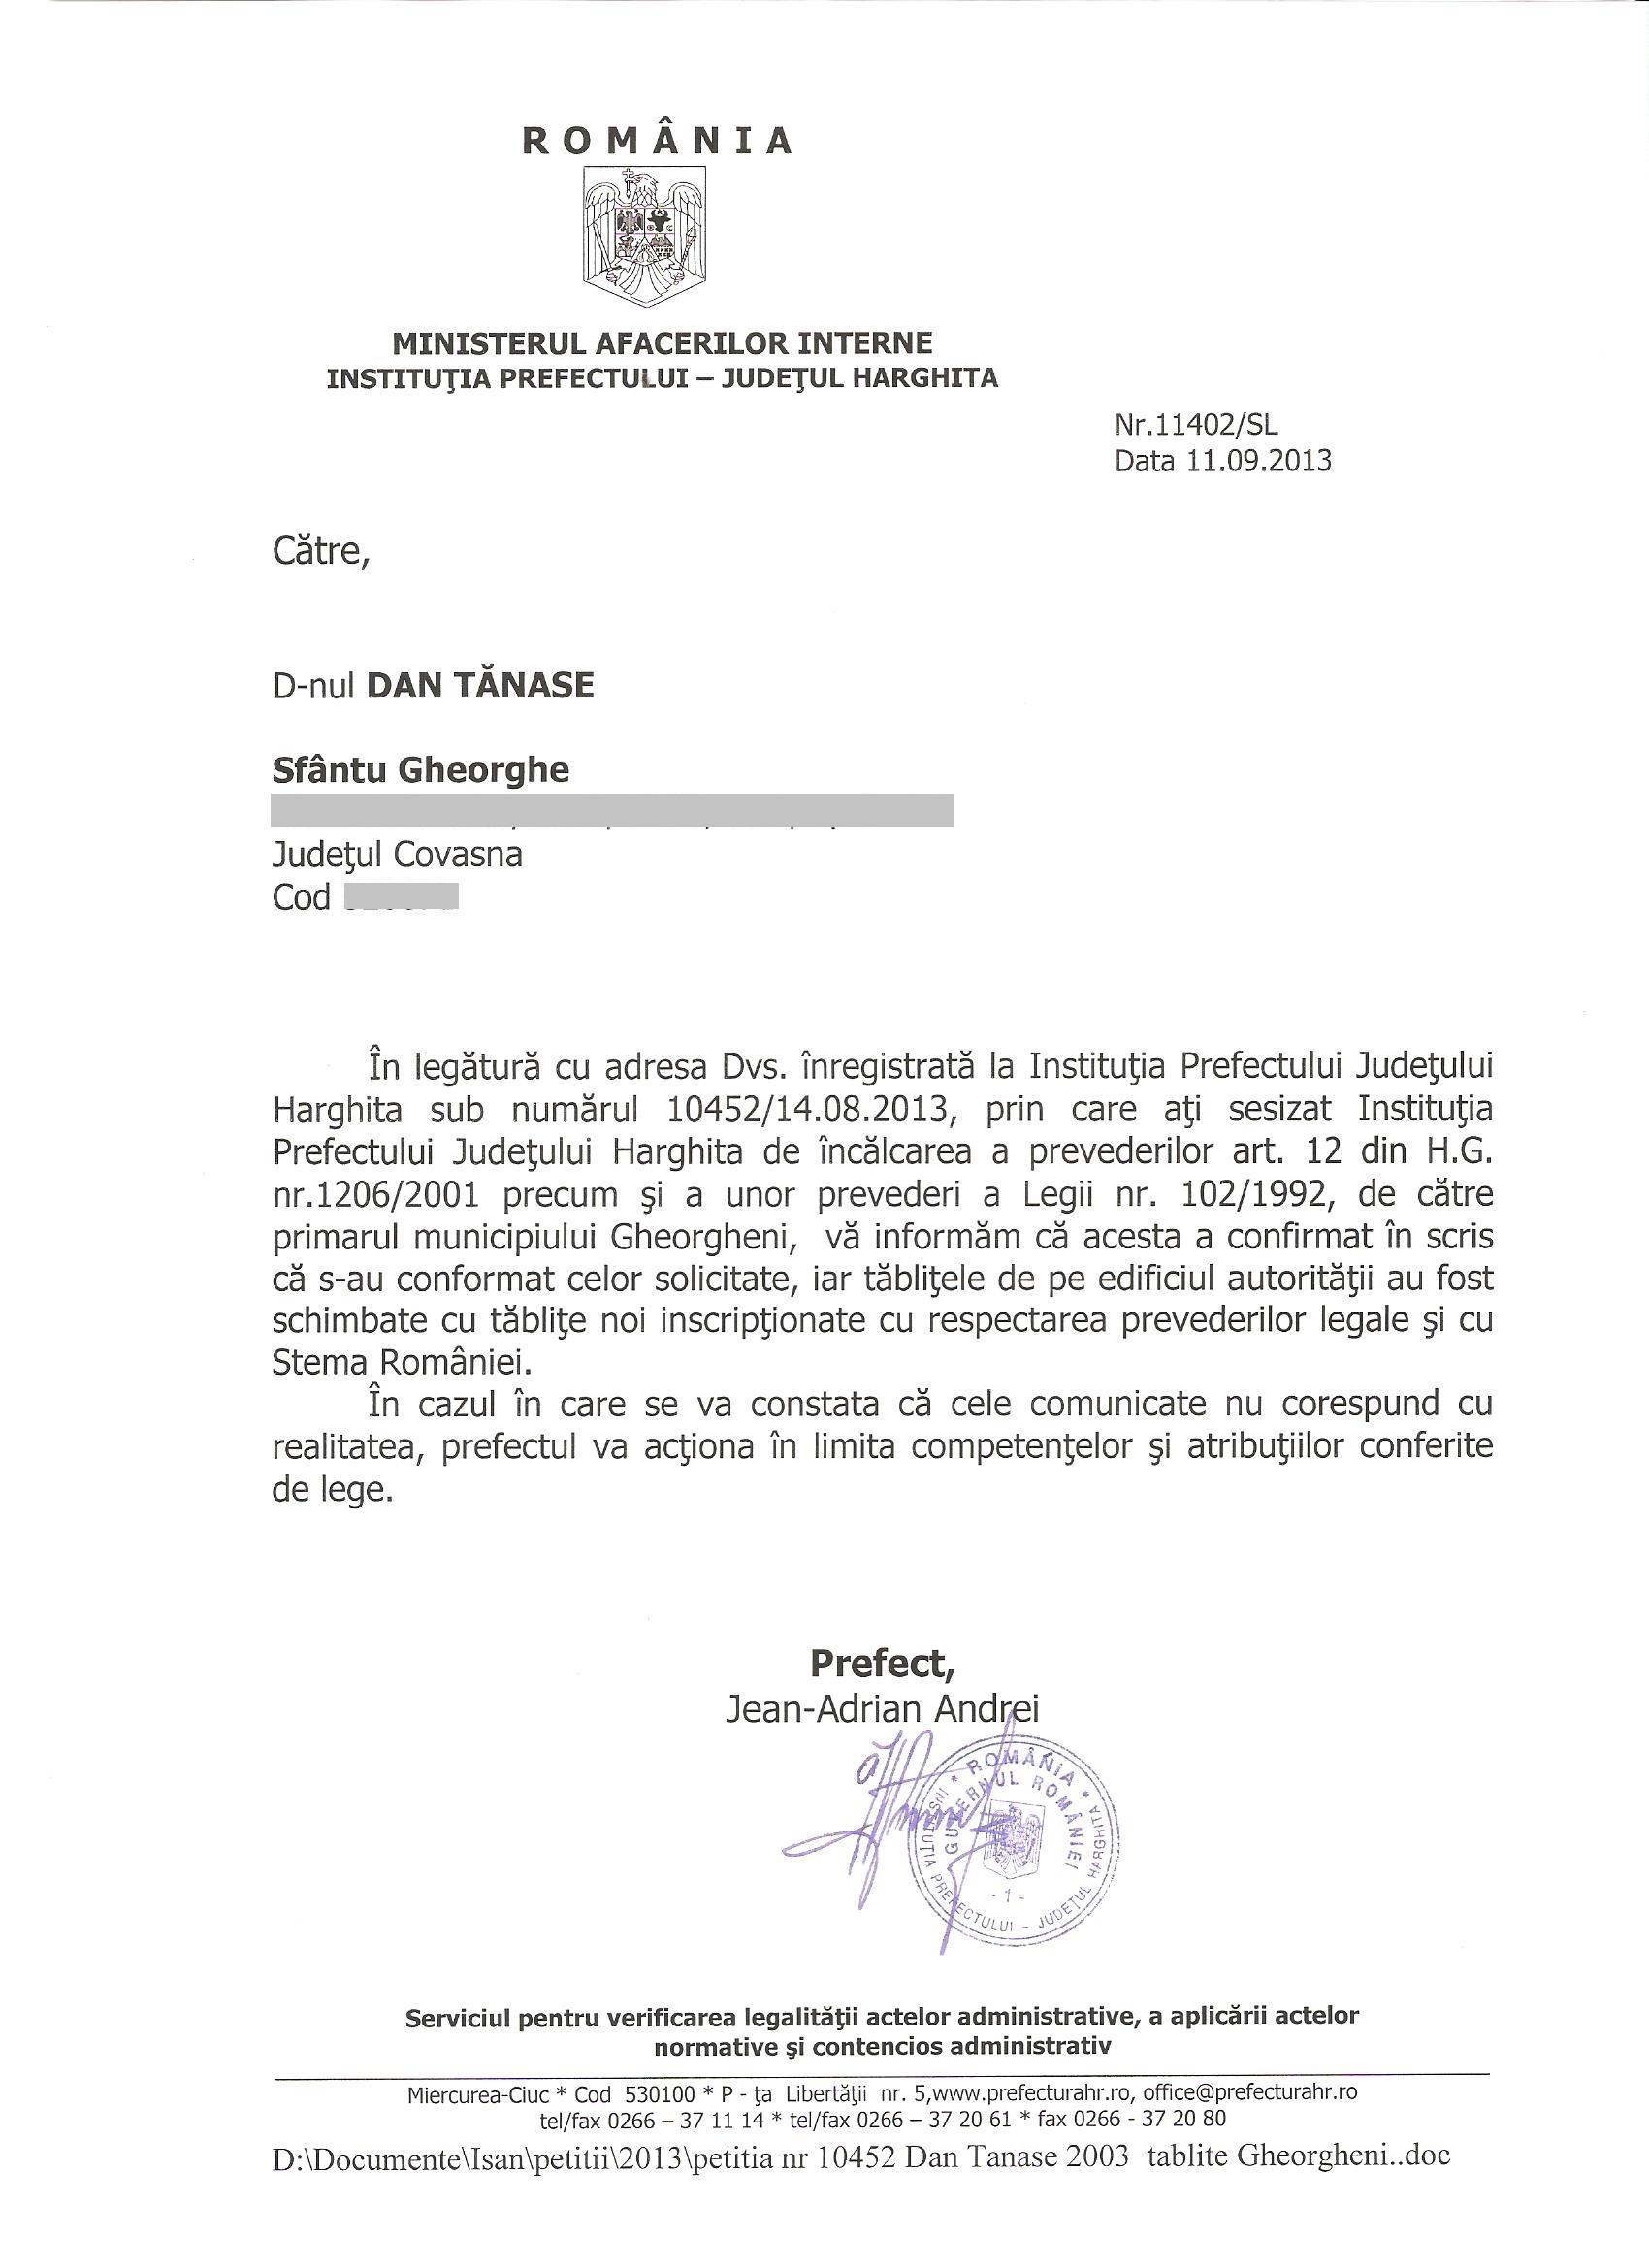 Prefect Harghita Primar Gheorgheni Mezey Janos Dan Tanasa placute stema Romaniei